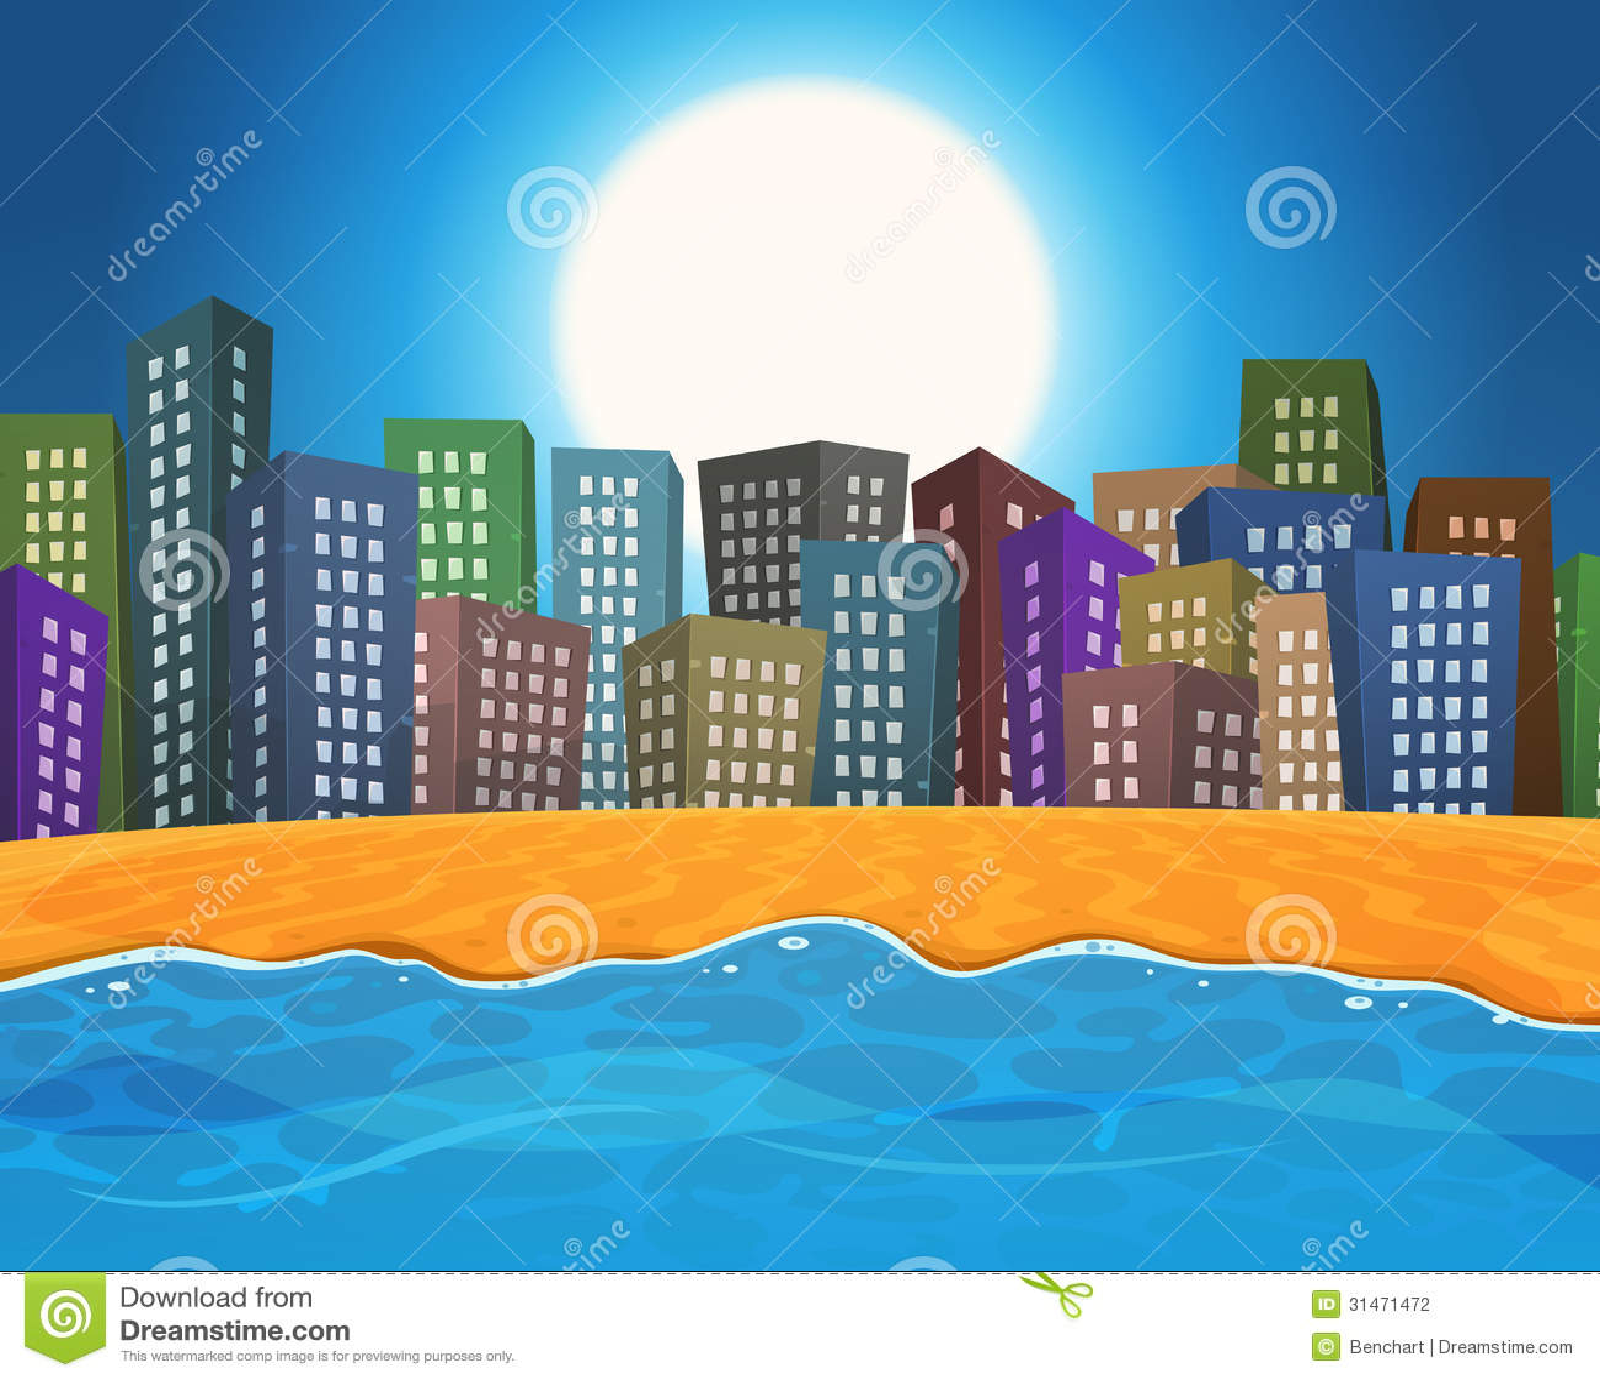 Summer Beach By The City